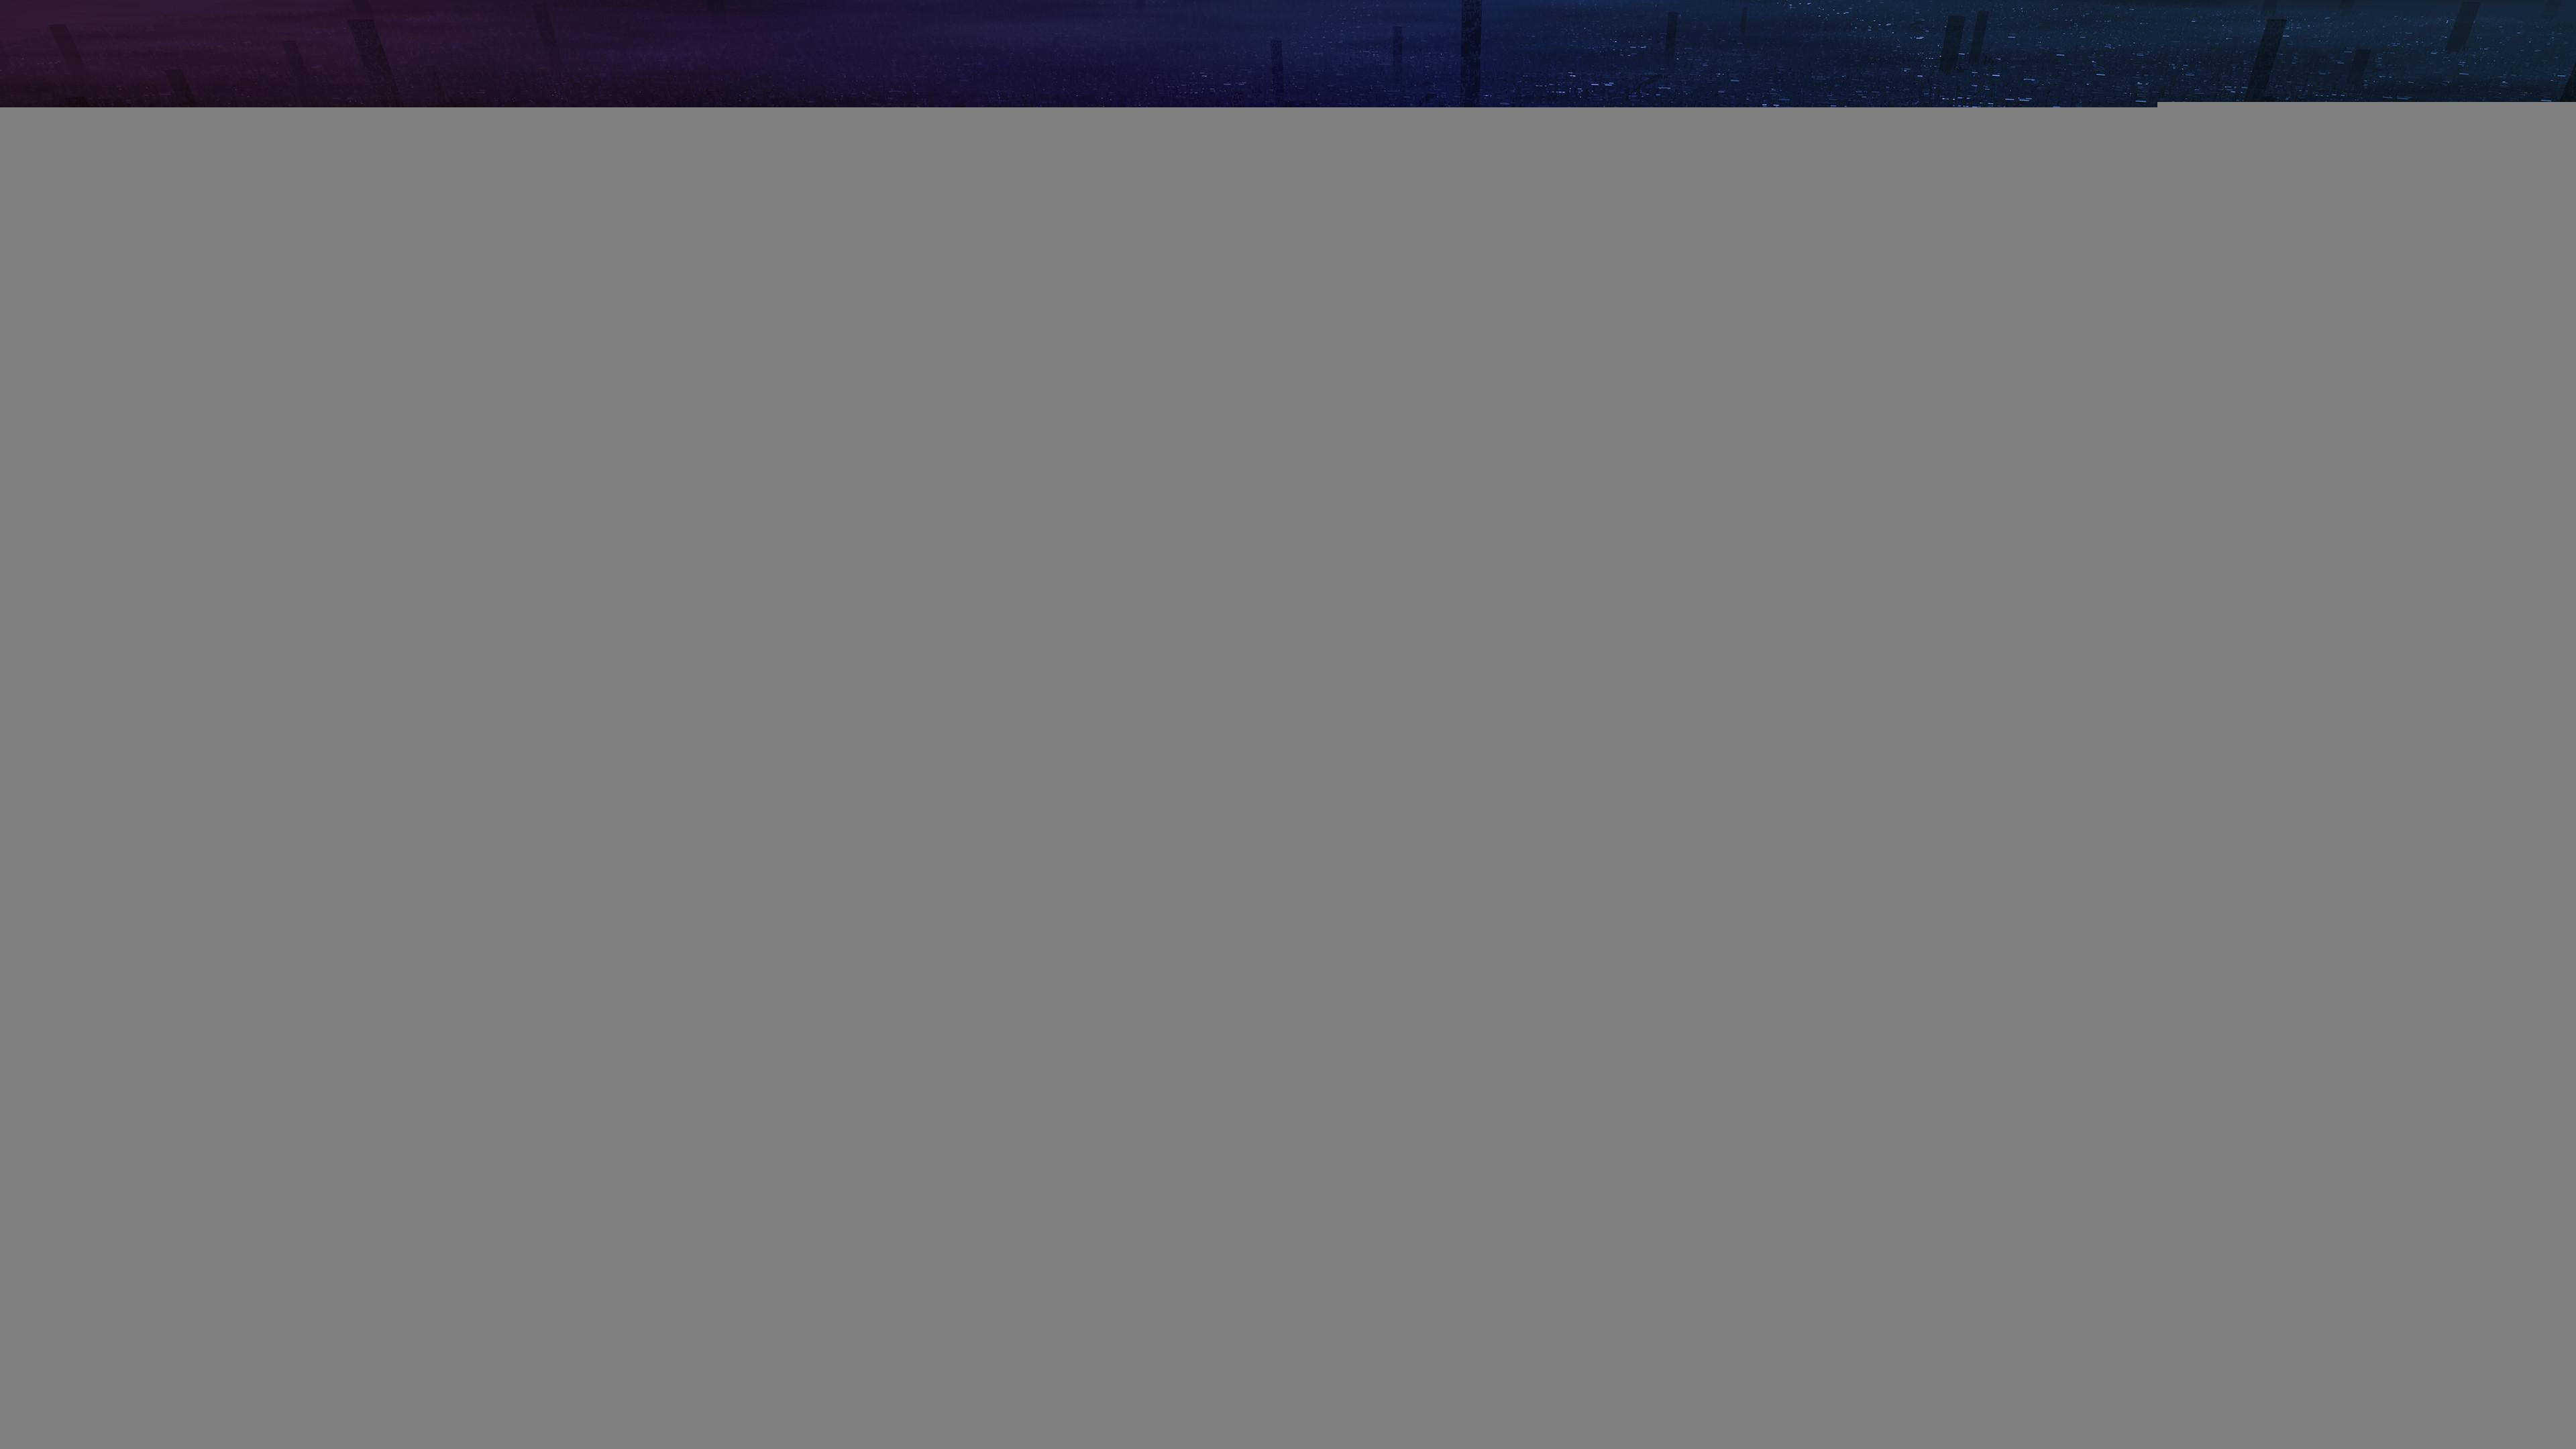 Res: 3840x2160, ASUS ROG City Neon Lights Wallpaper